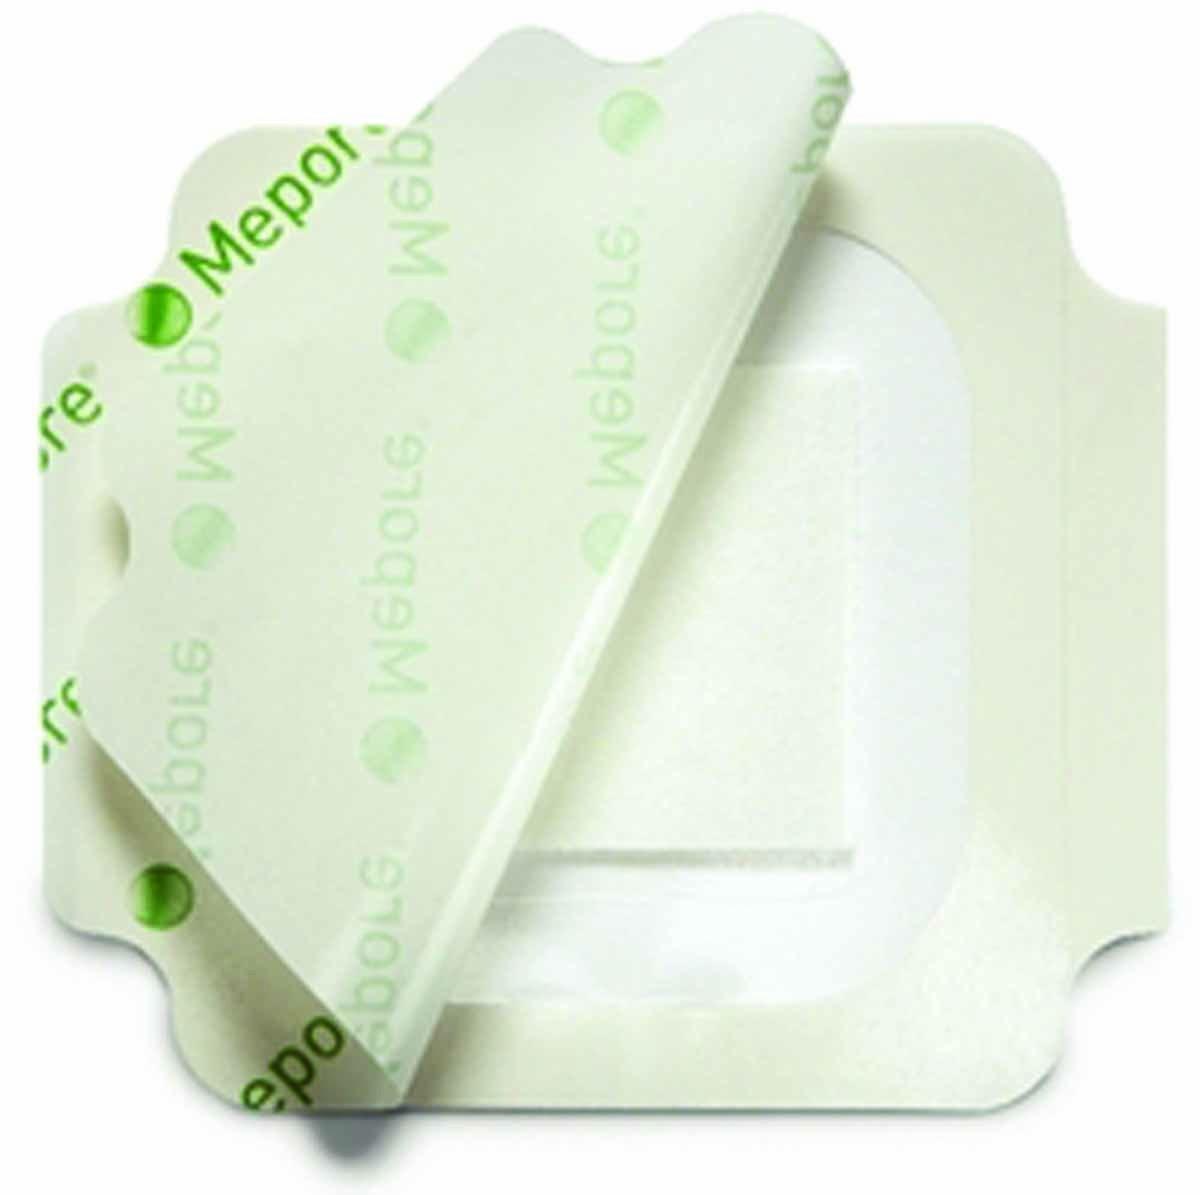 Mepore Film & Pad повязка на рану стерильная, прозрачная, водонепроницаемая 5 х 7 см